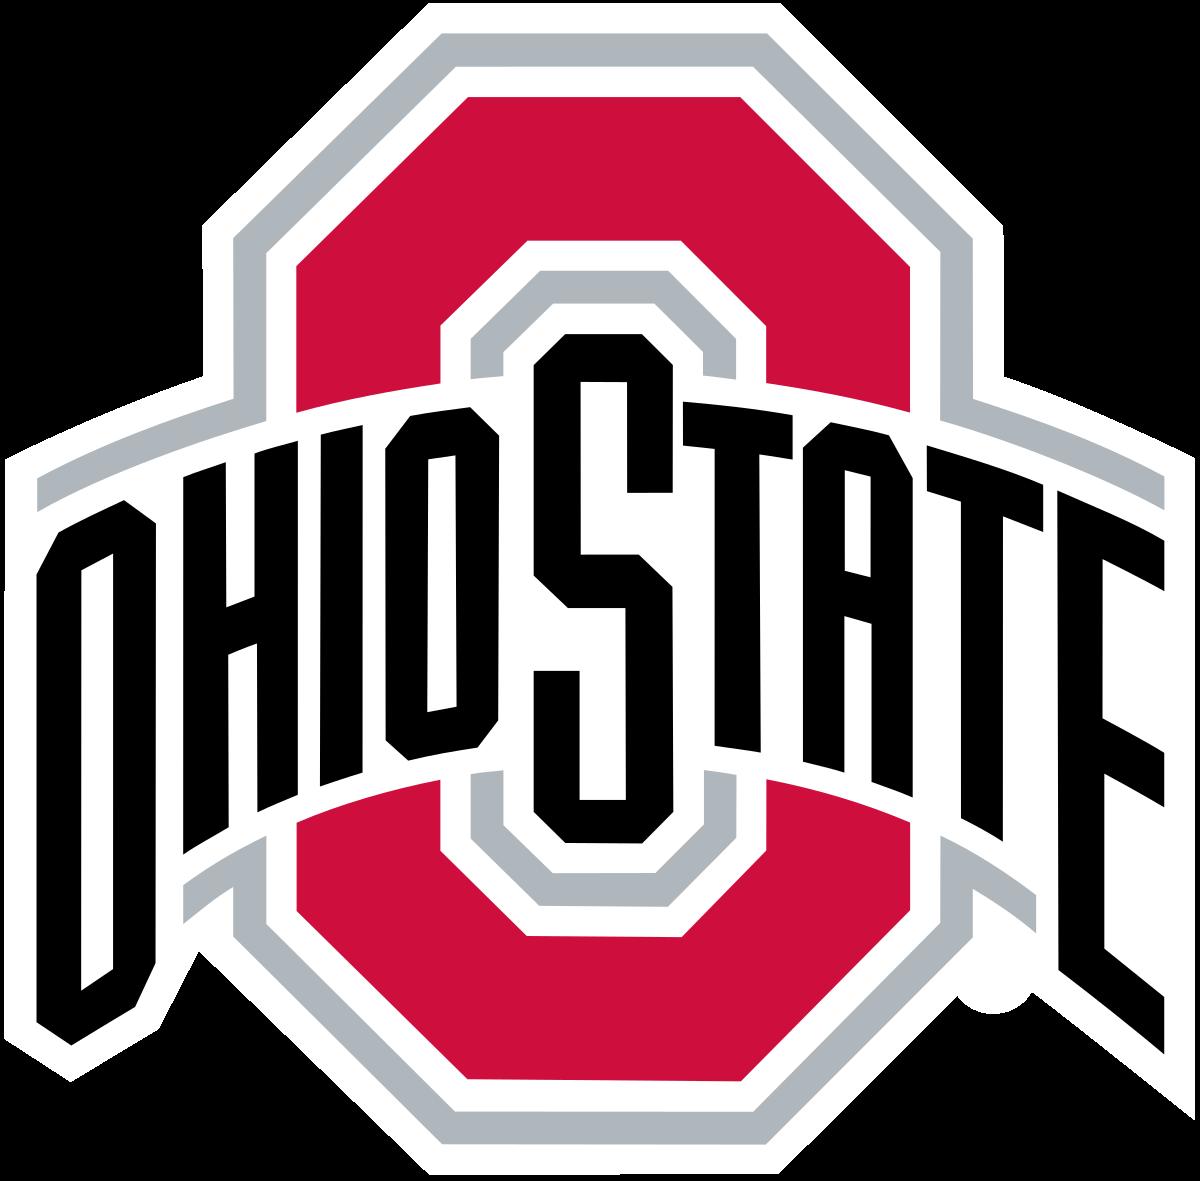 The Ohio State State University